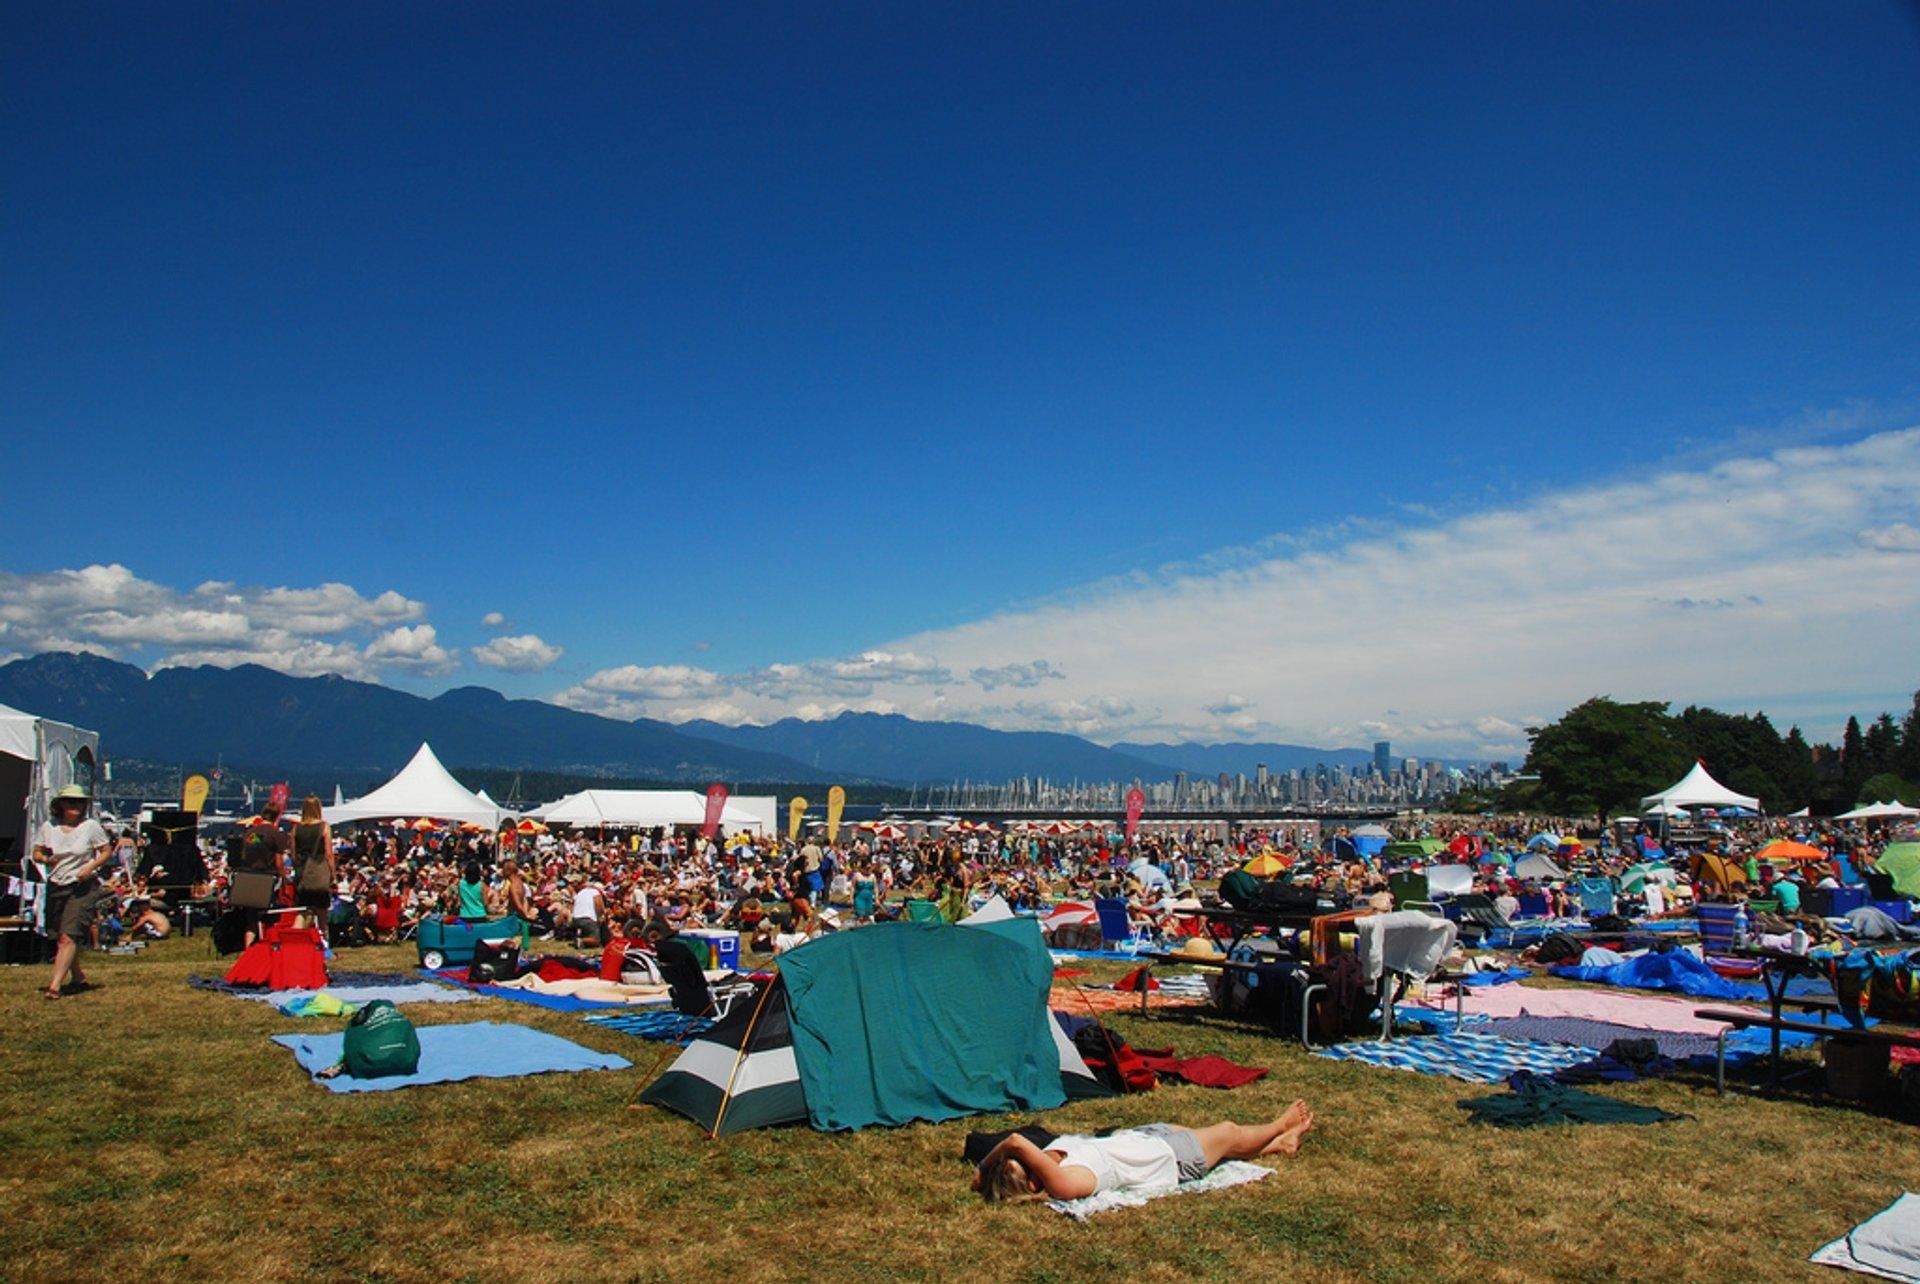 Vancouver Folk Music Festival in Vancouver - Best Season